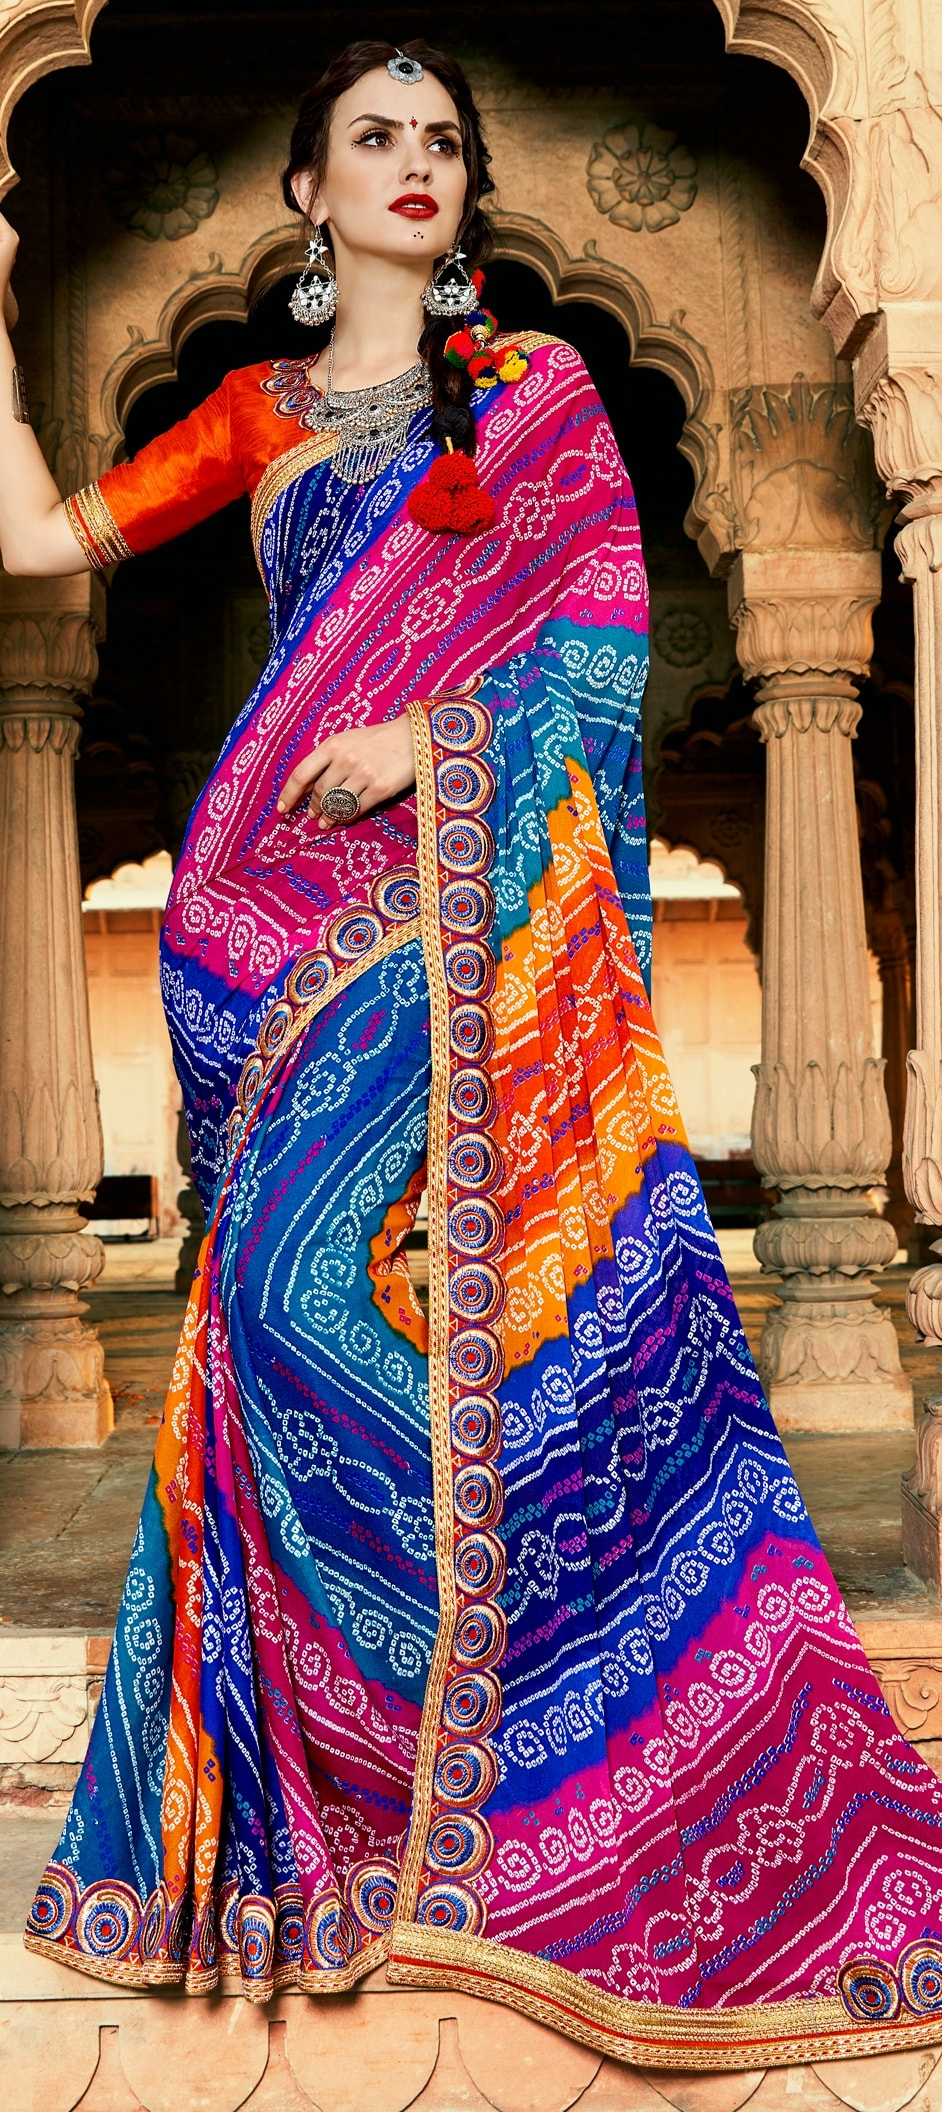 ff41976cc3 Sarees, Lehengas, Wedding Dresses, Choli - Indianweddingsarees ...